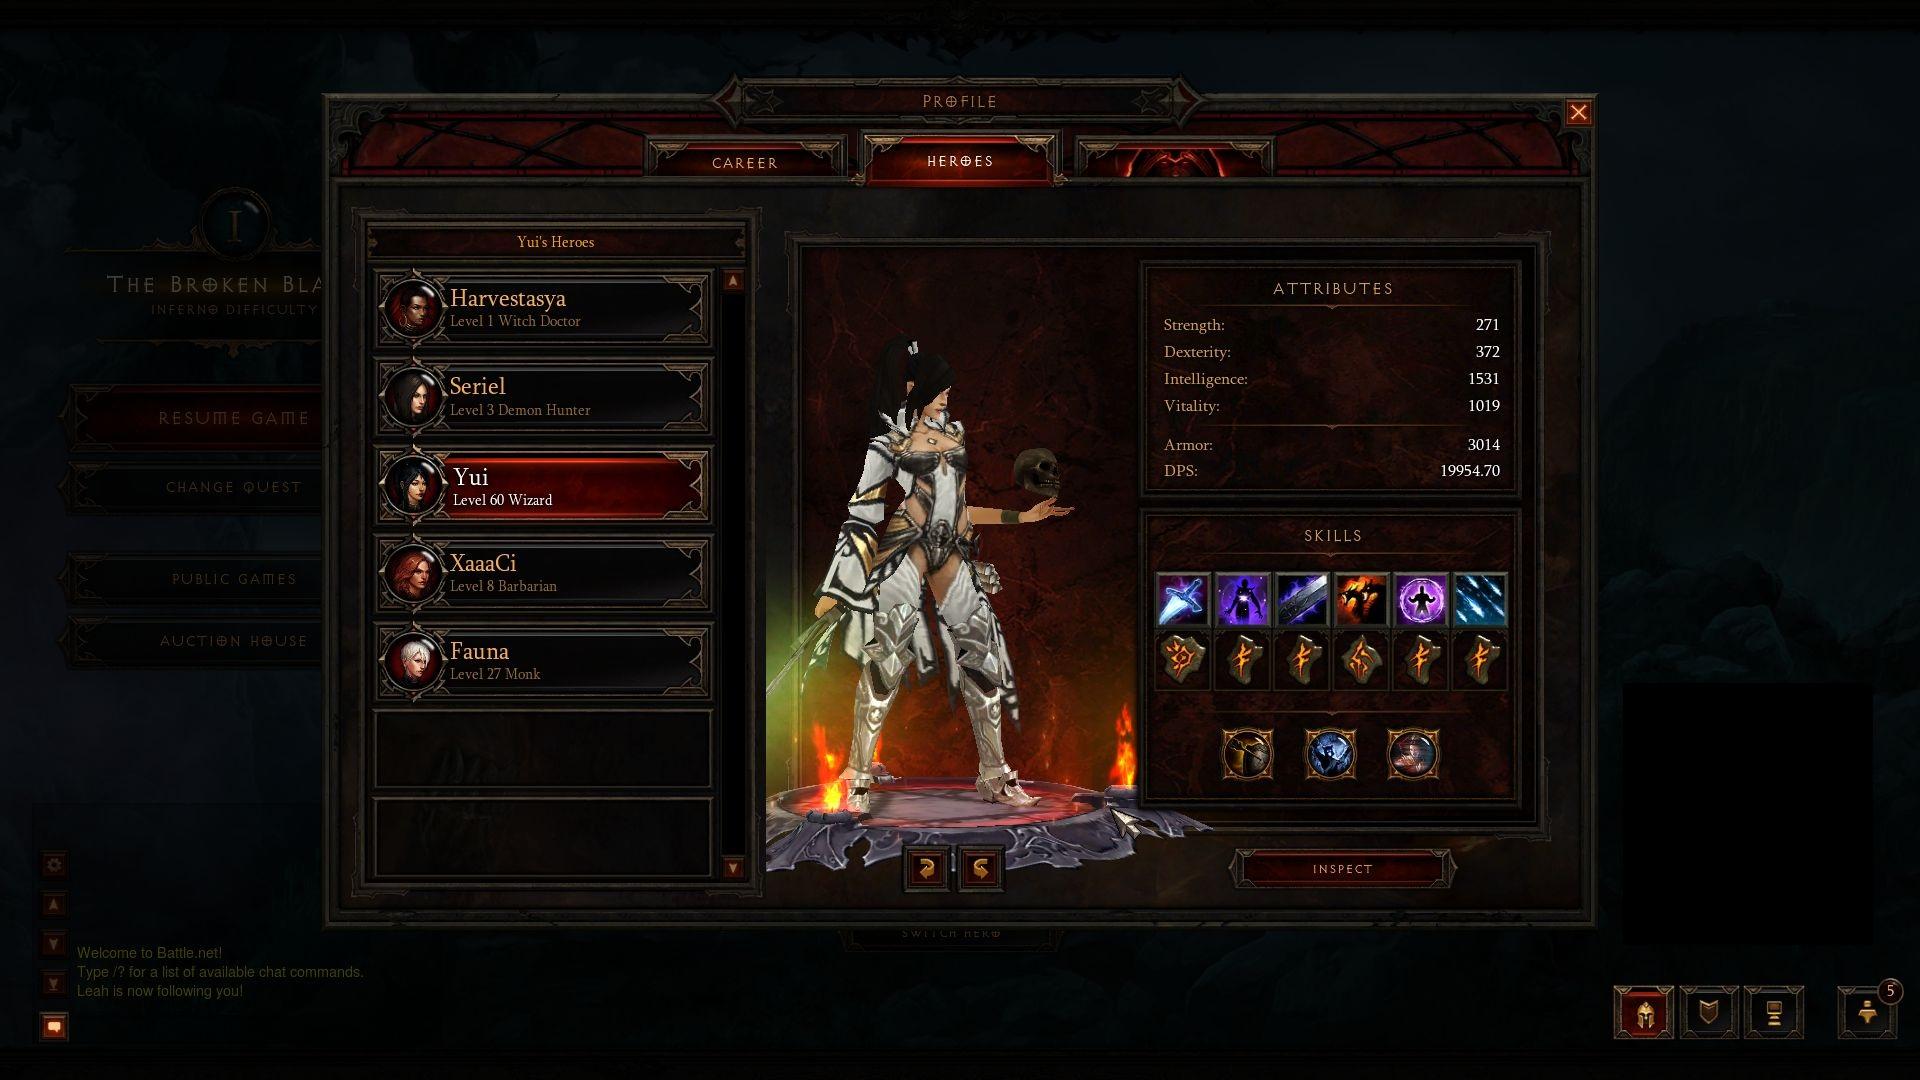 Diablo3_stat_002.jpg